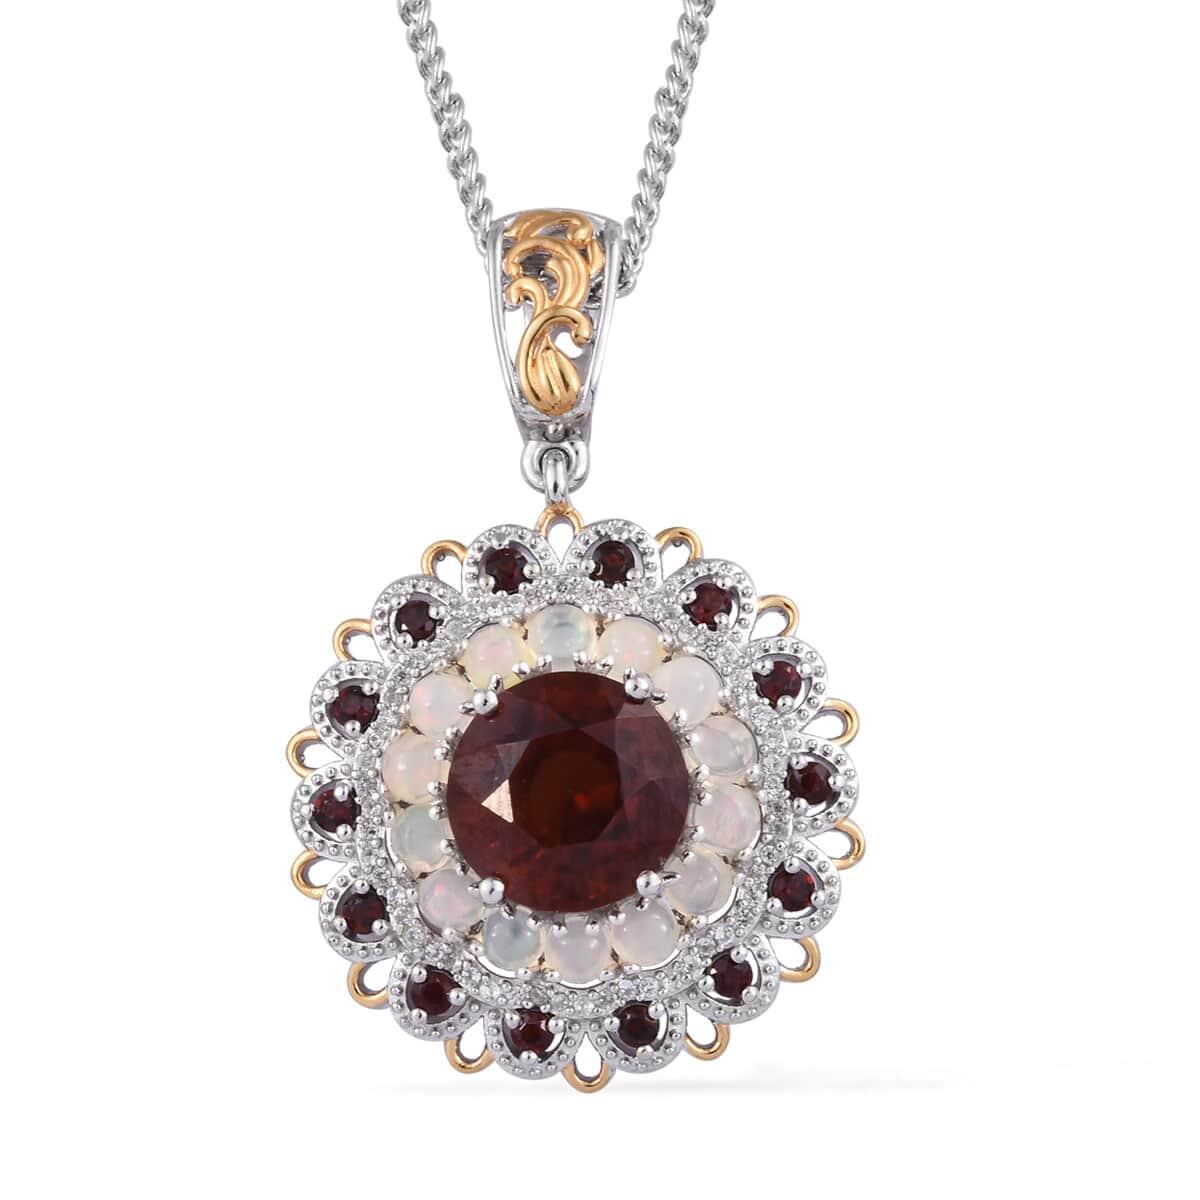 AAA Premium Ratnapura Hessonite Garnet, Multi Gemstone Pendant Necklace (20 in) in Vermeil YG and Platinum Over Sterling Silver 8.40 ctw